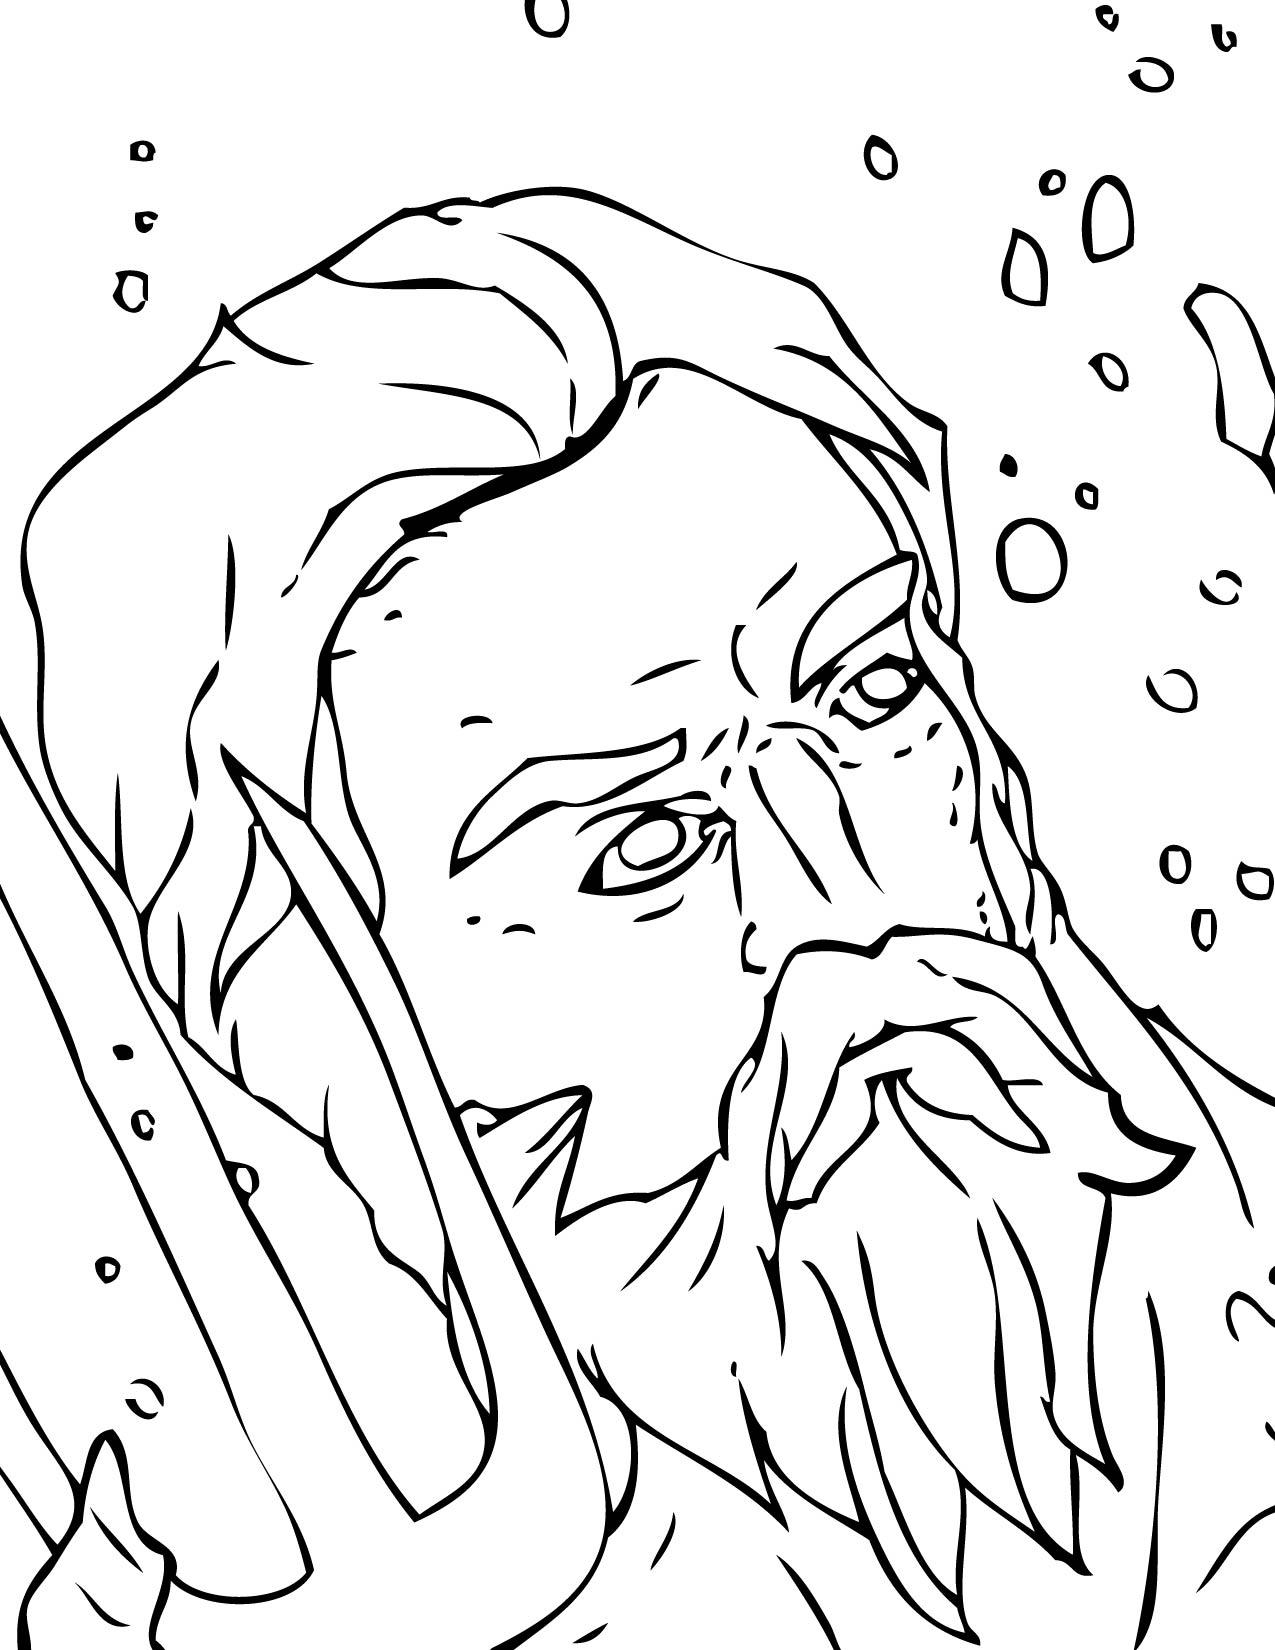 Zeus Greek Mythology Coloring Pages